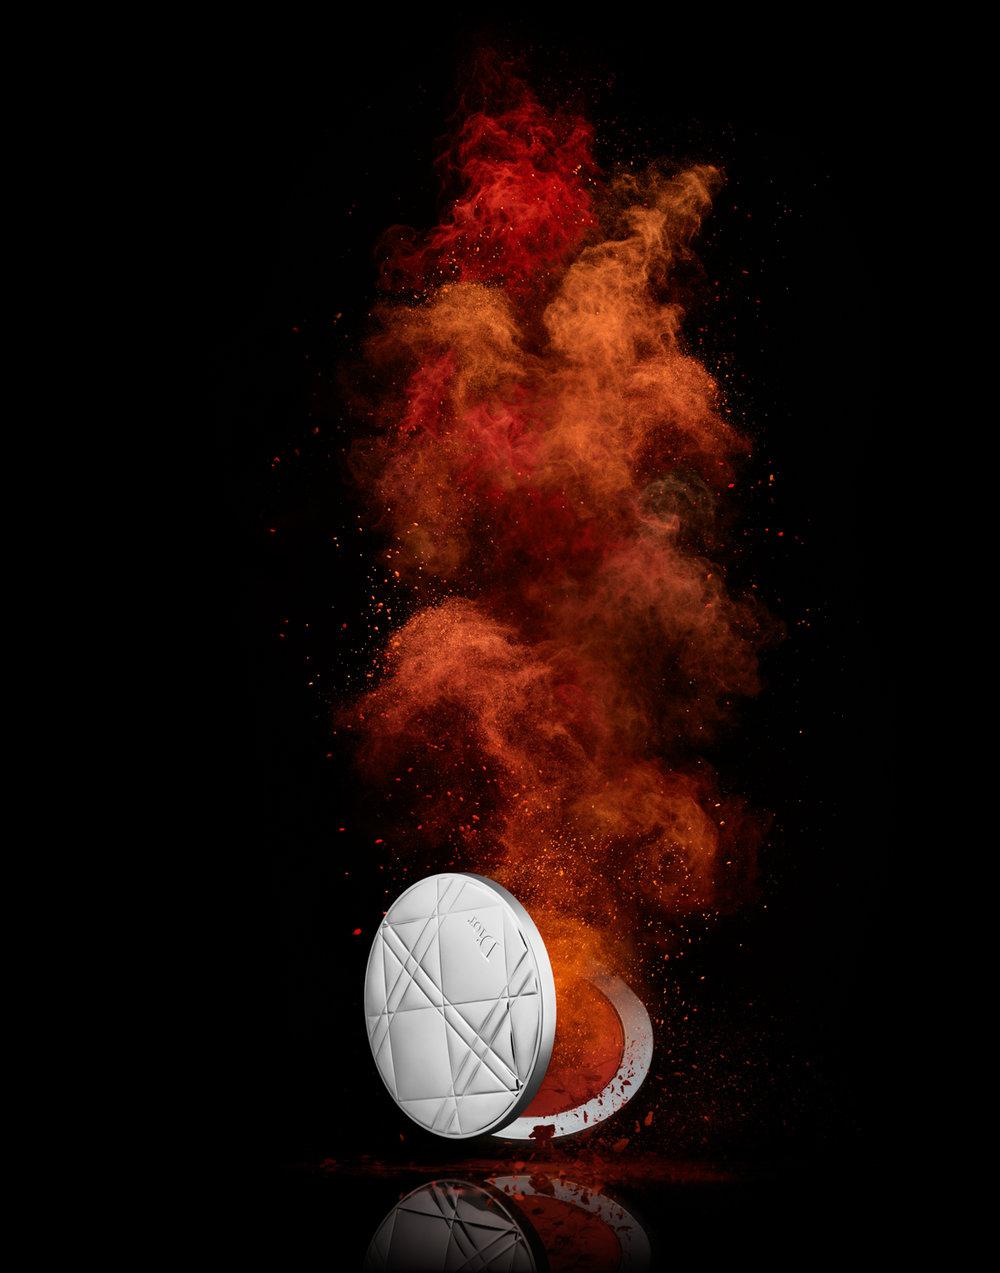 160402 Cosmetics Fire.jpg